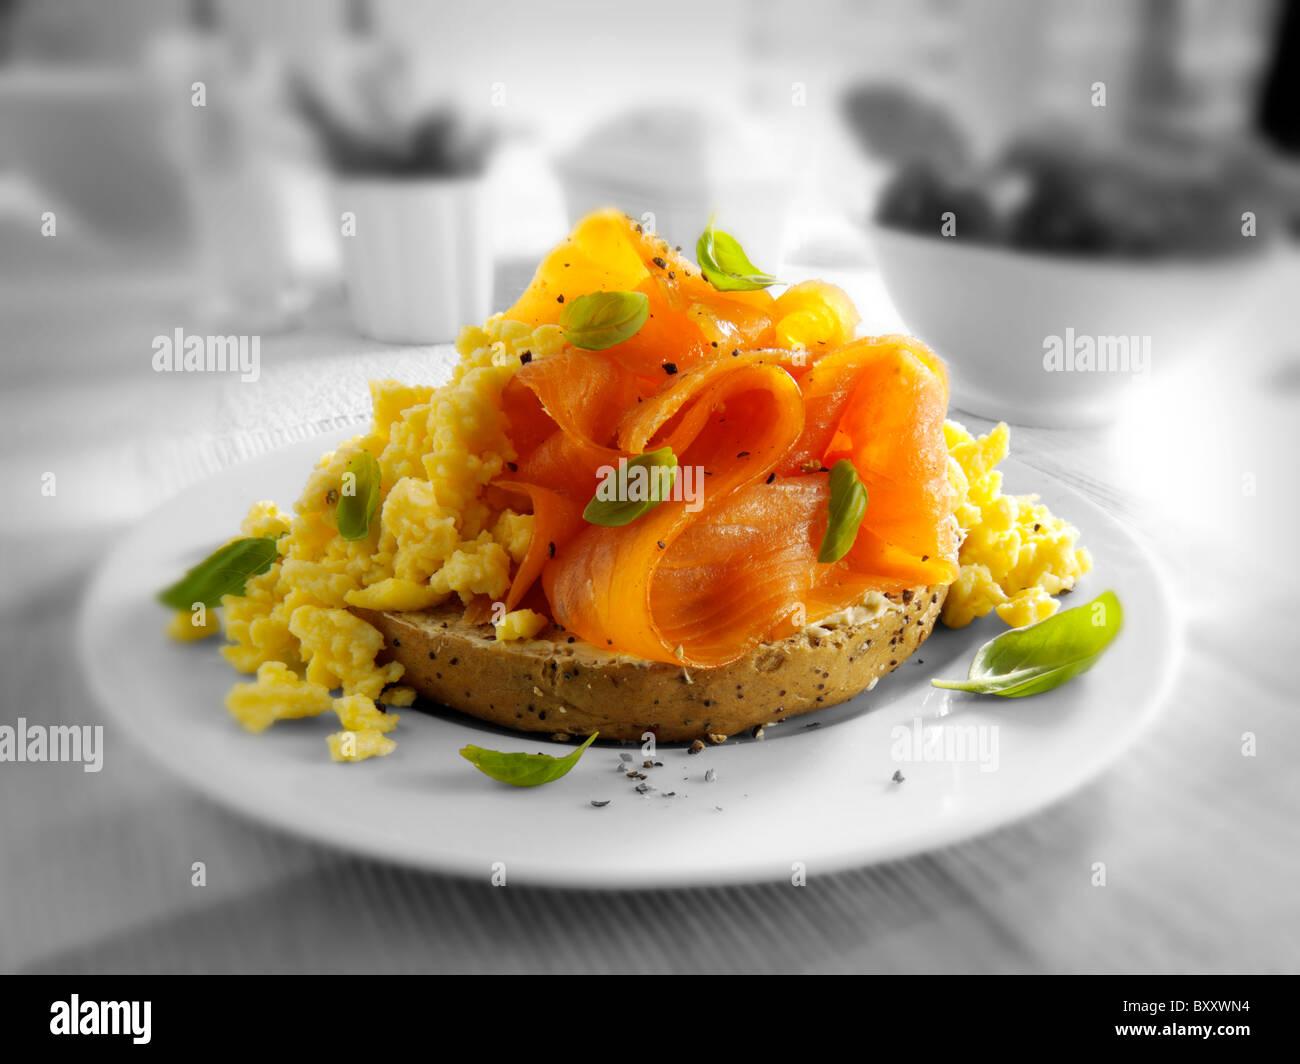 Smoked Salmon & scrambled eggs Bagel - Stock Image